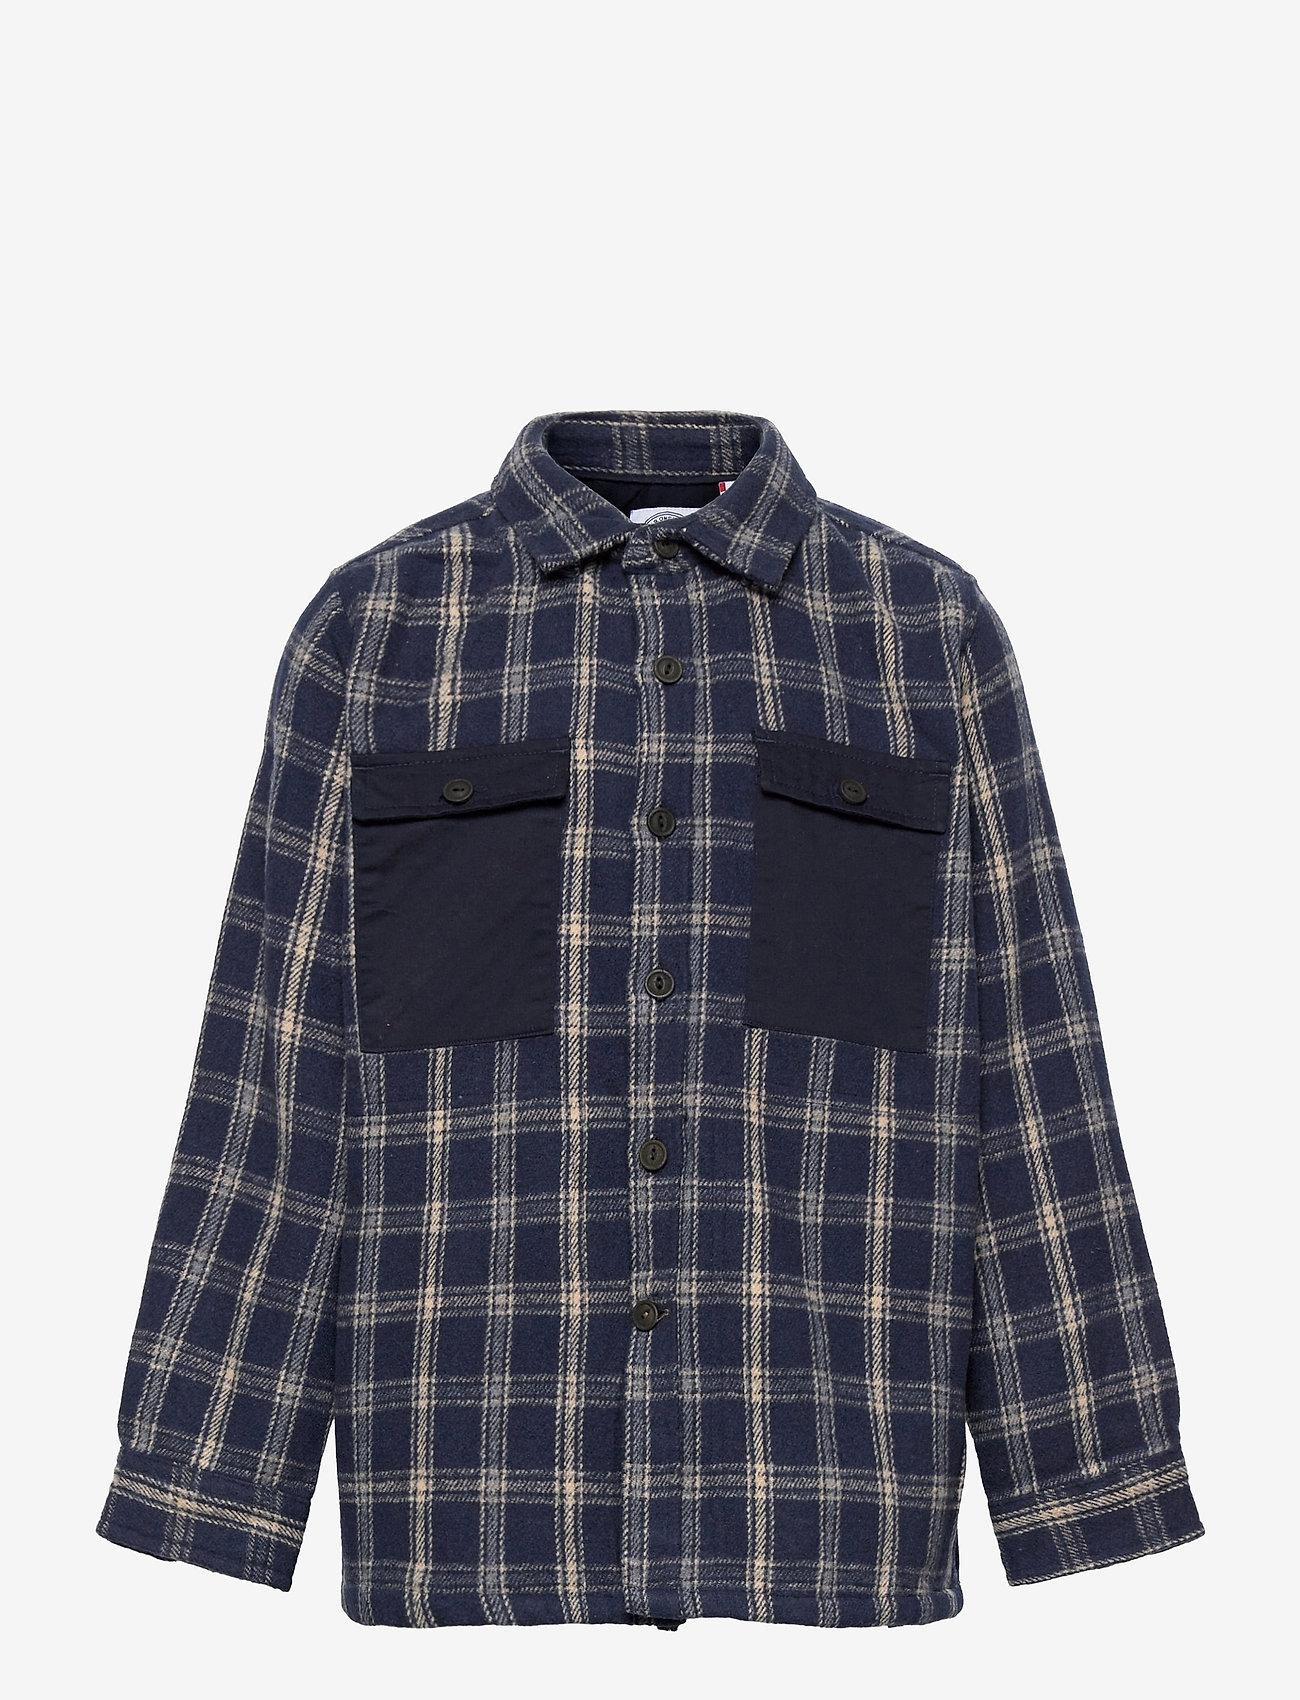 Kronstadt - Oliver Check - shirts - navy - 0